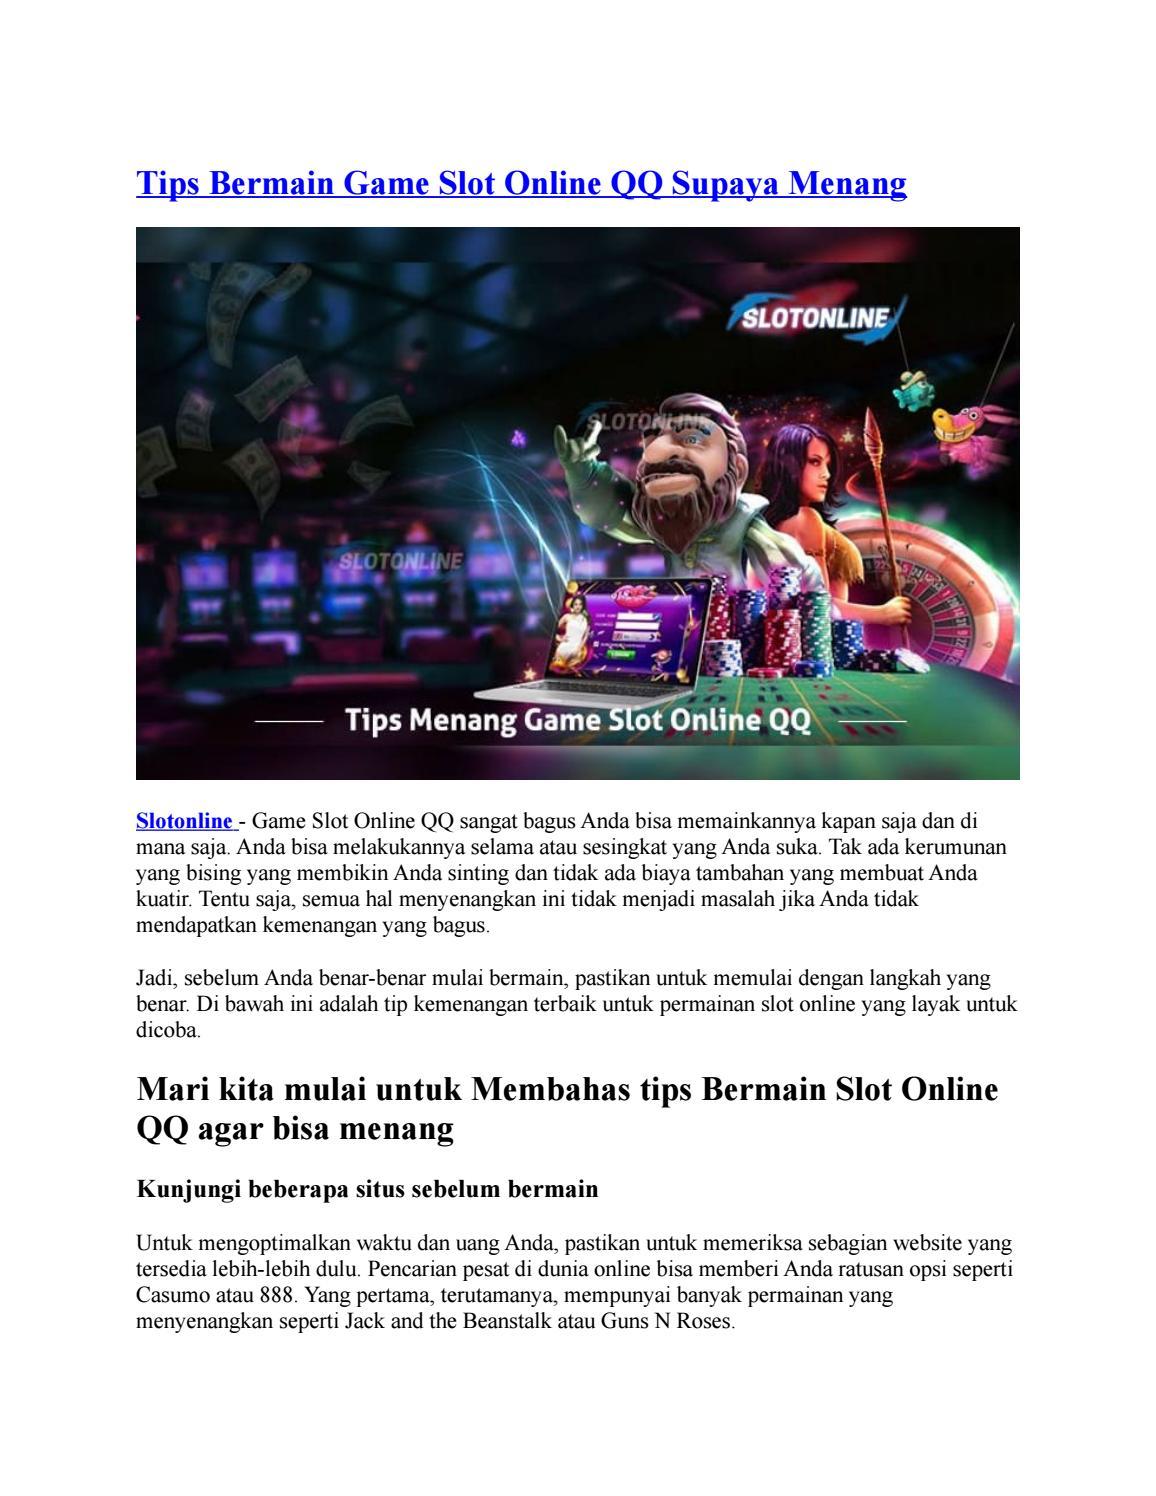 Tips Bermain Game Slot Online Qq Supaya Menang By Slot Online Indonesia Issuu